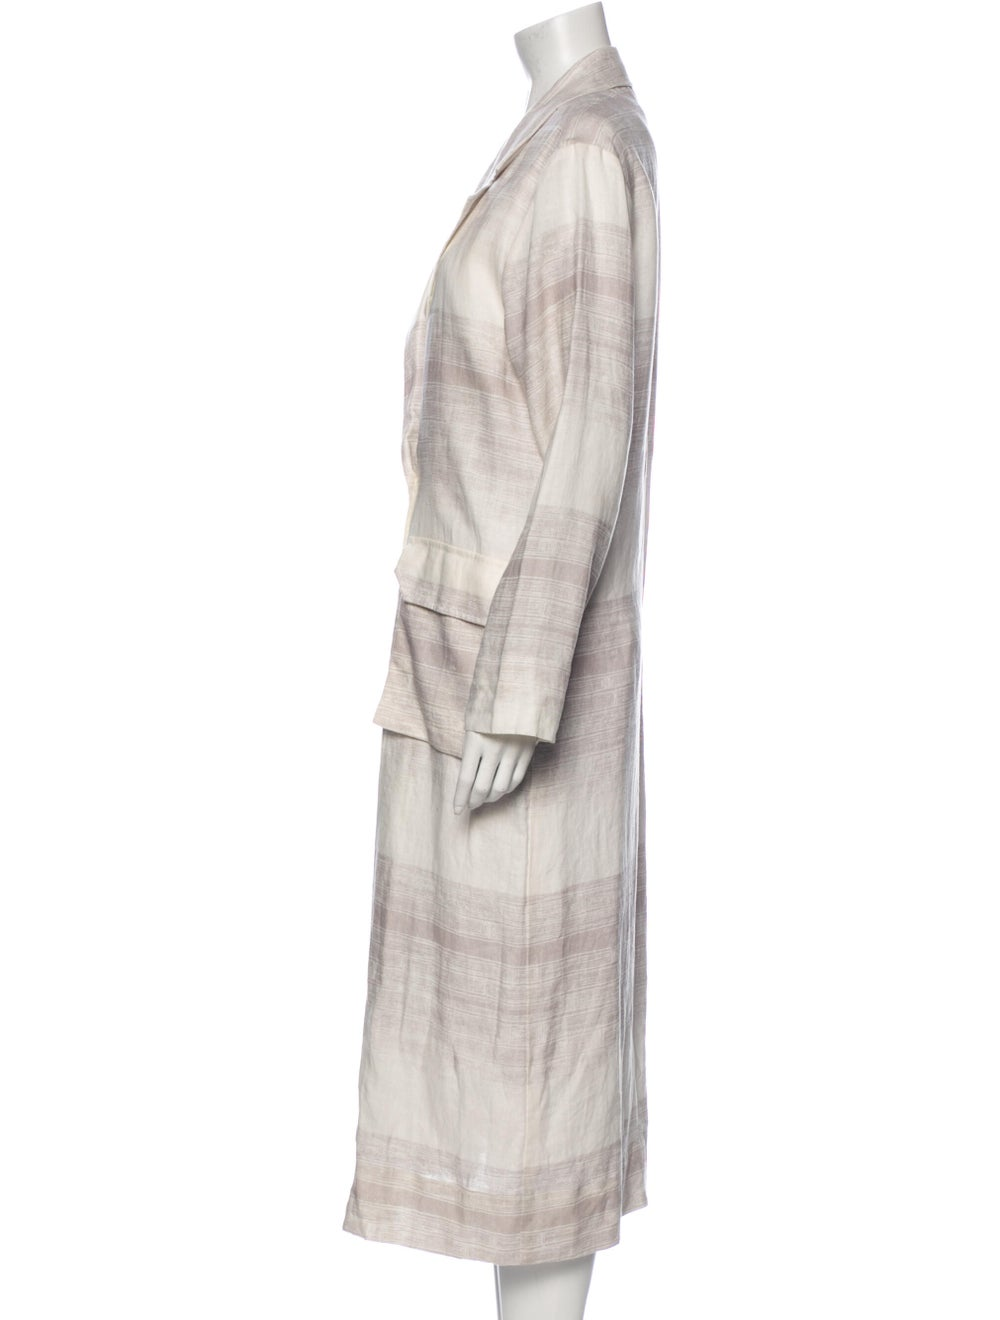 Raquel Allegra Linen Striped Jacket White - image 2